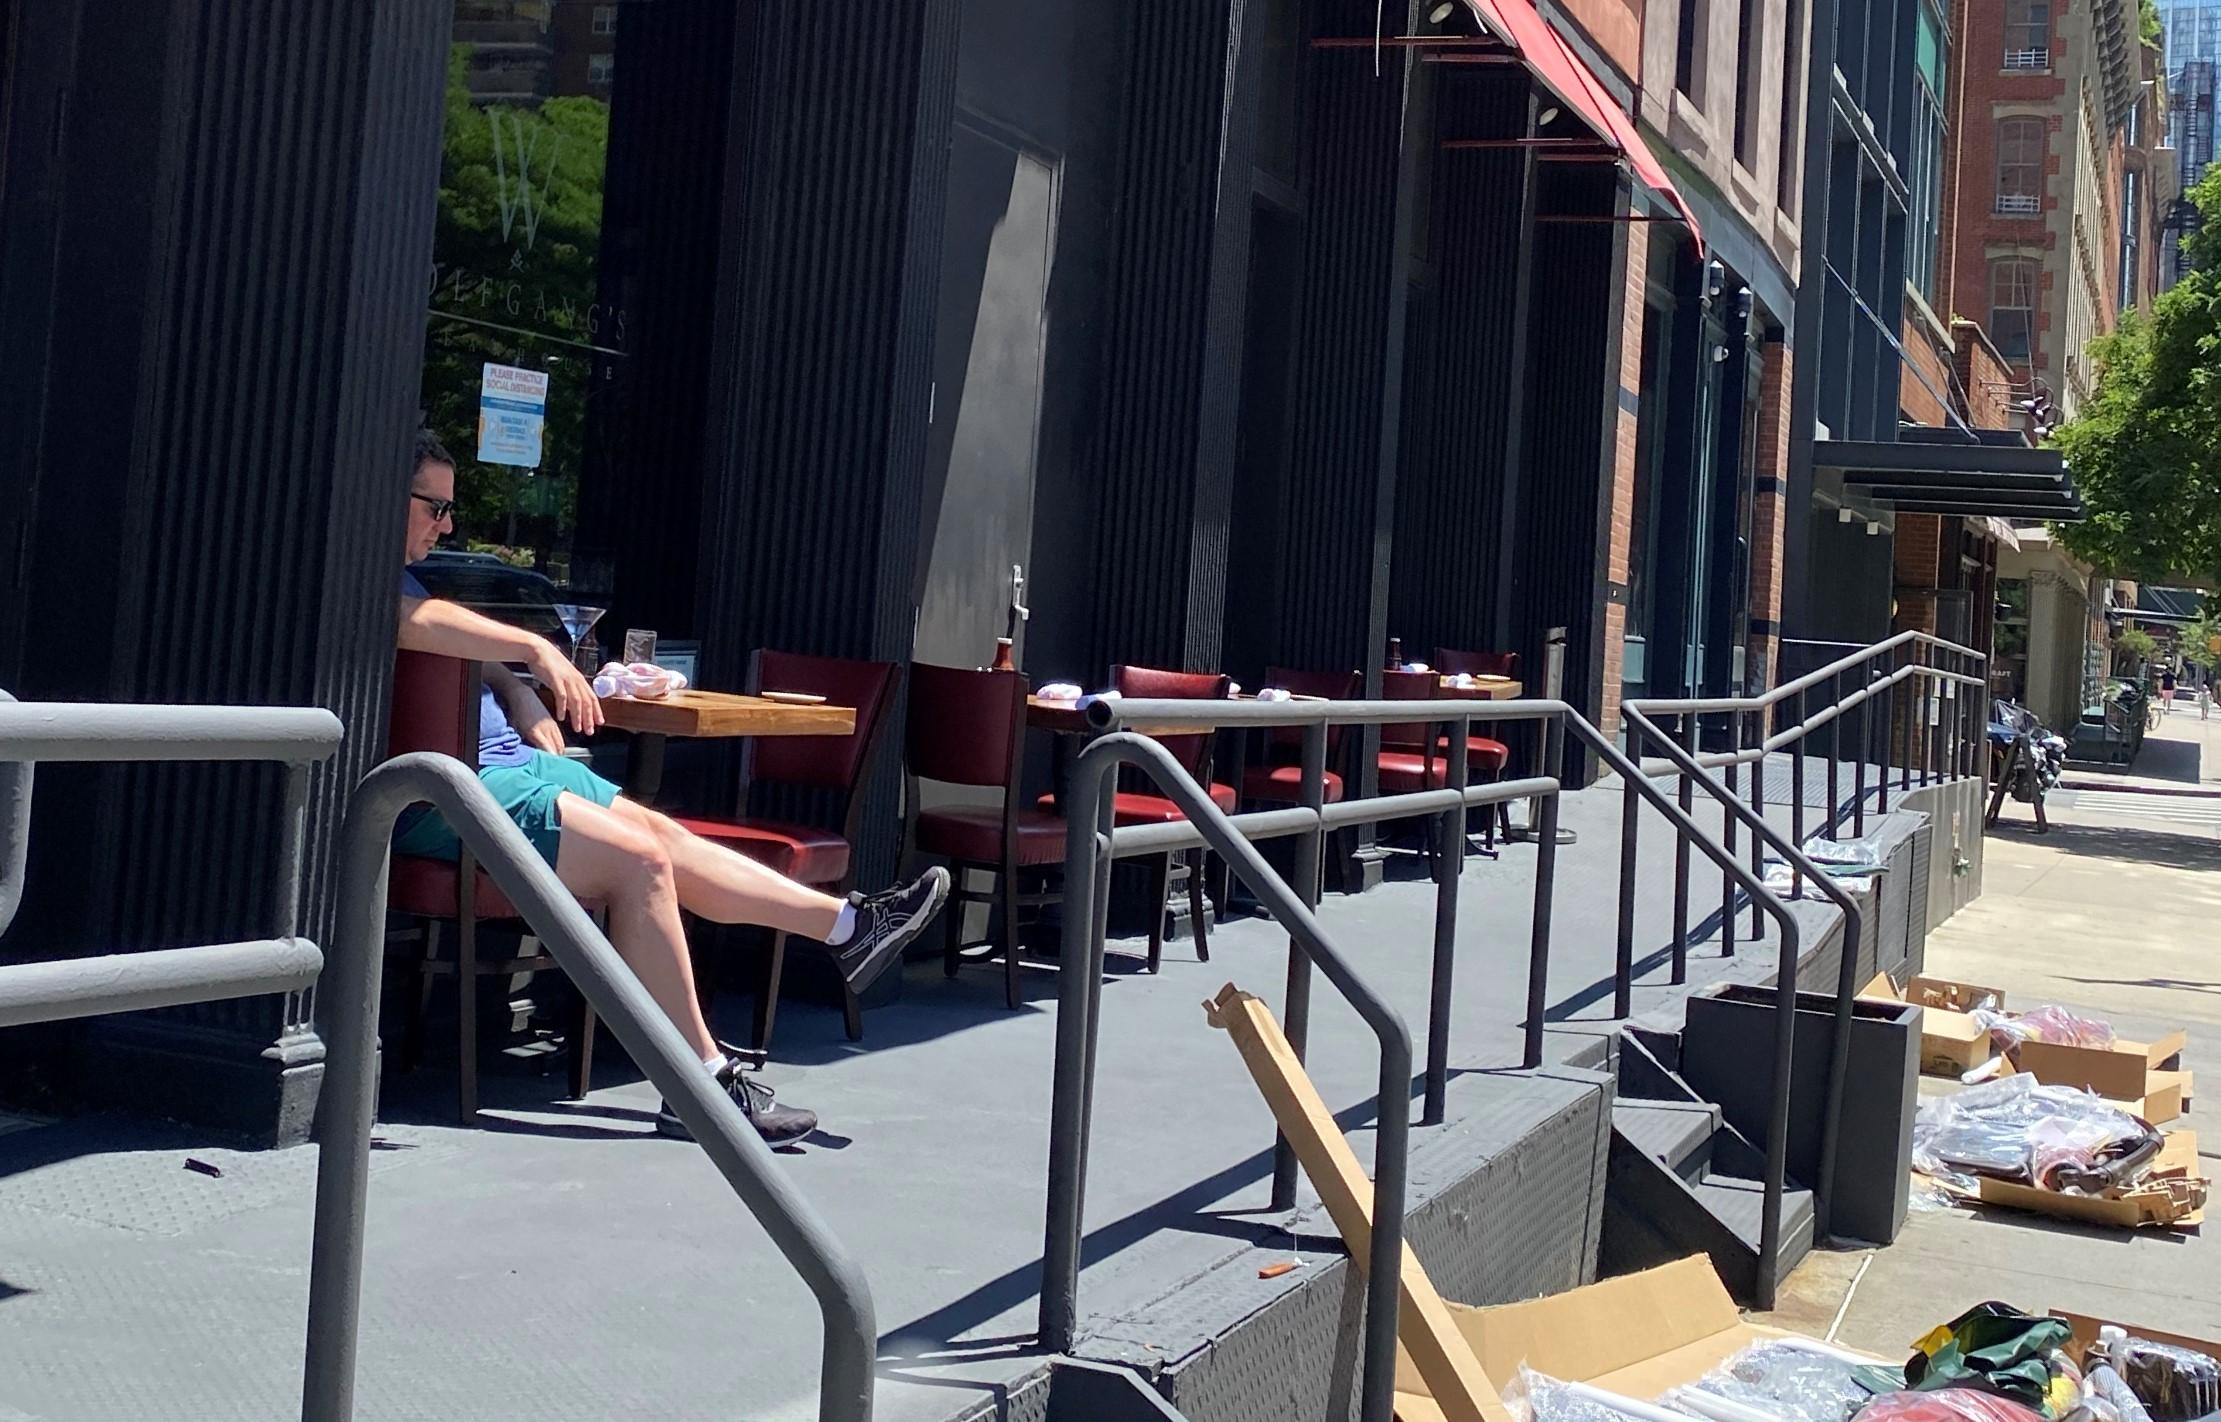 Tribeca Citizen | The latest openings around the neighborhood